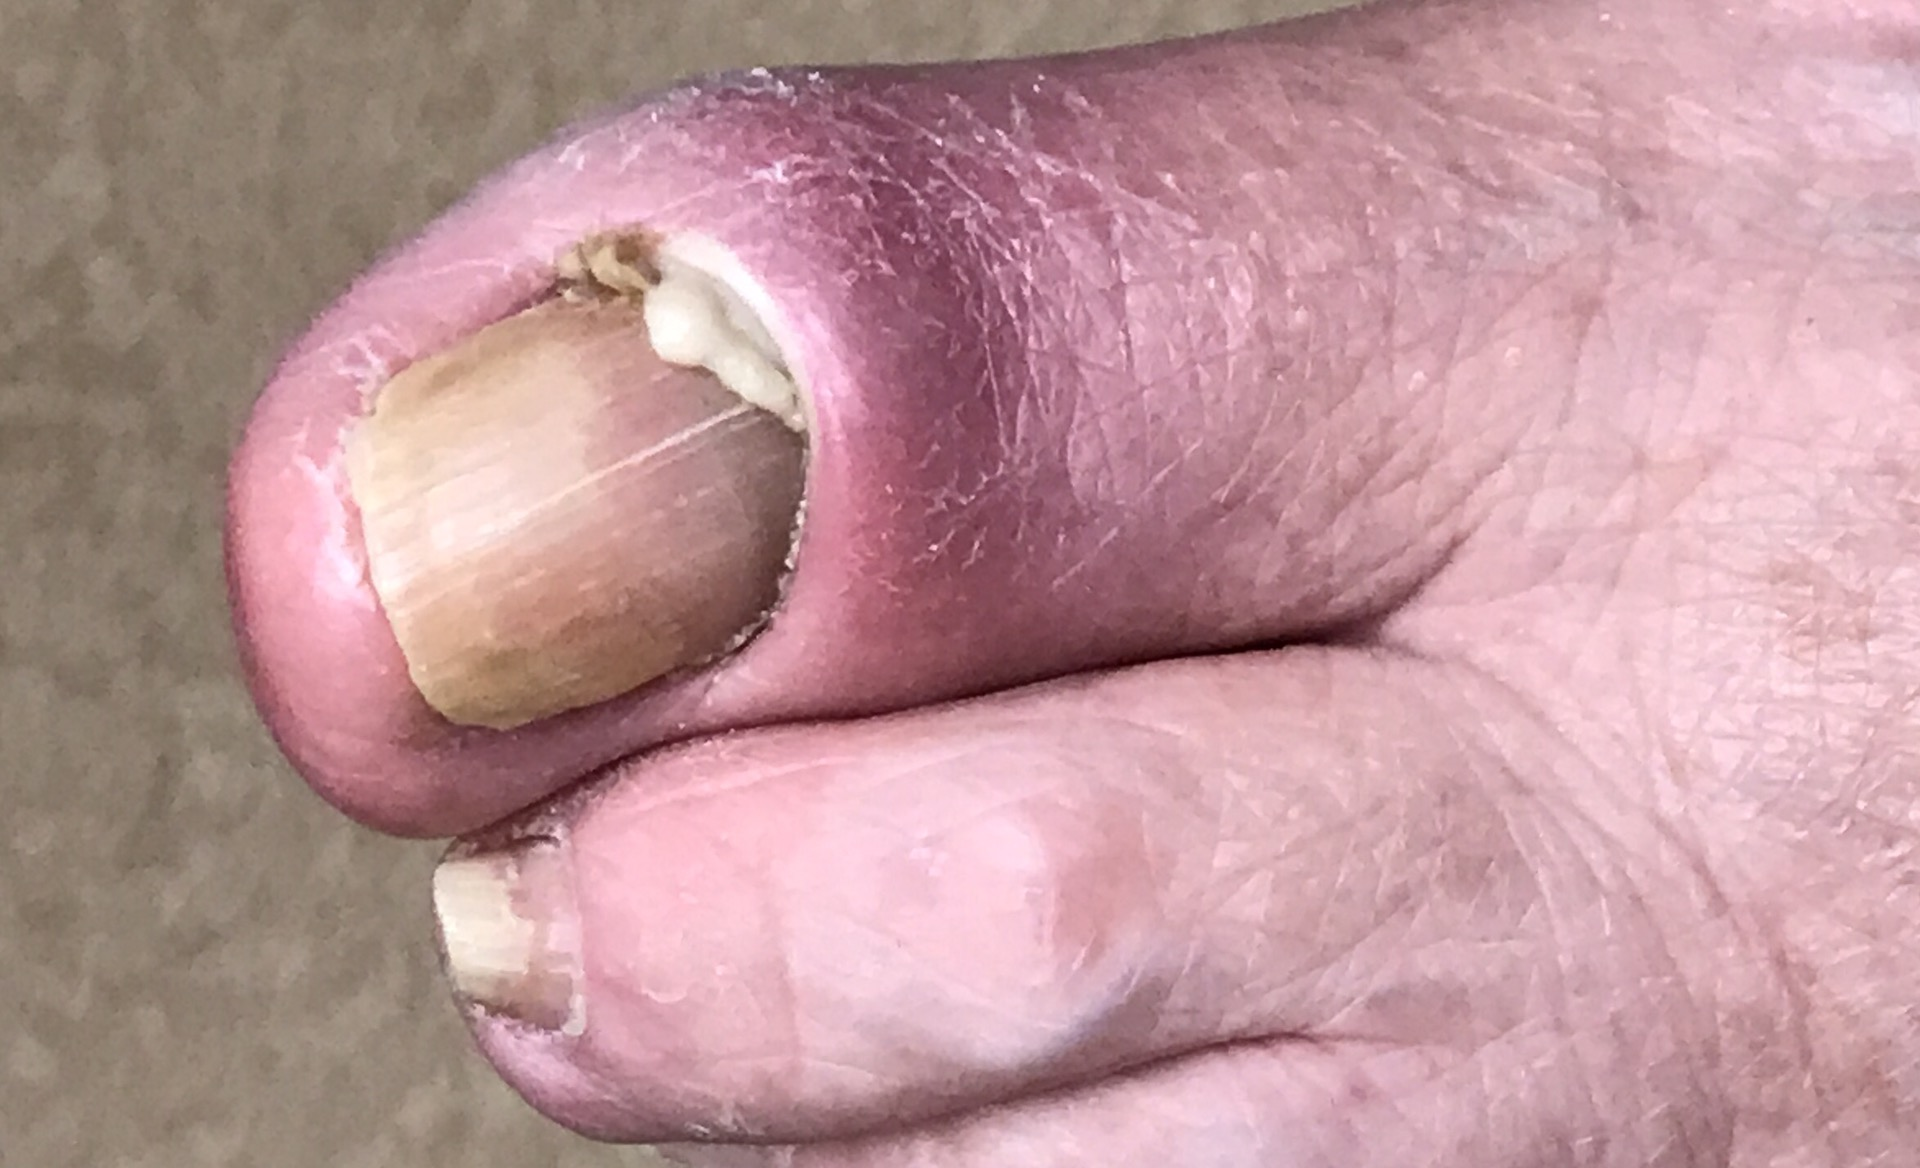 Infected toenail or nail fungus? - Dr. Nicholas Campitelli | Akron ...